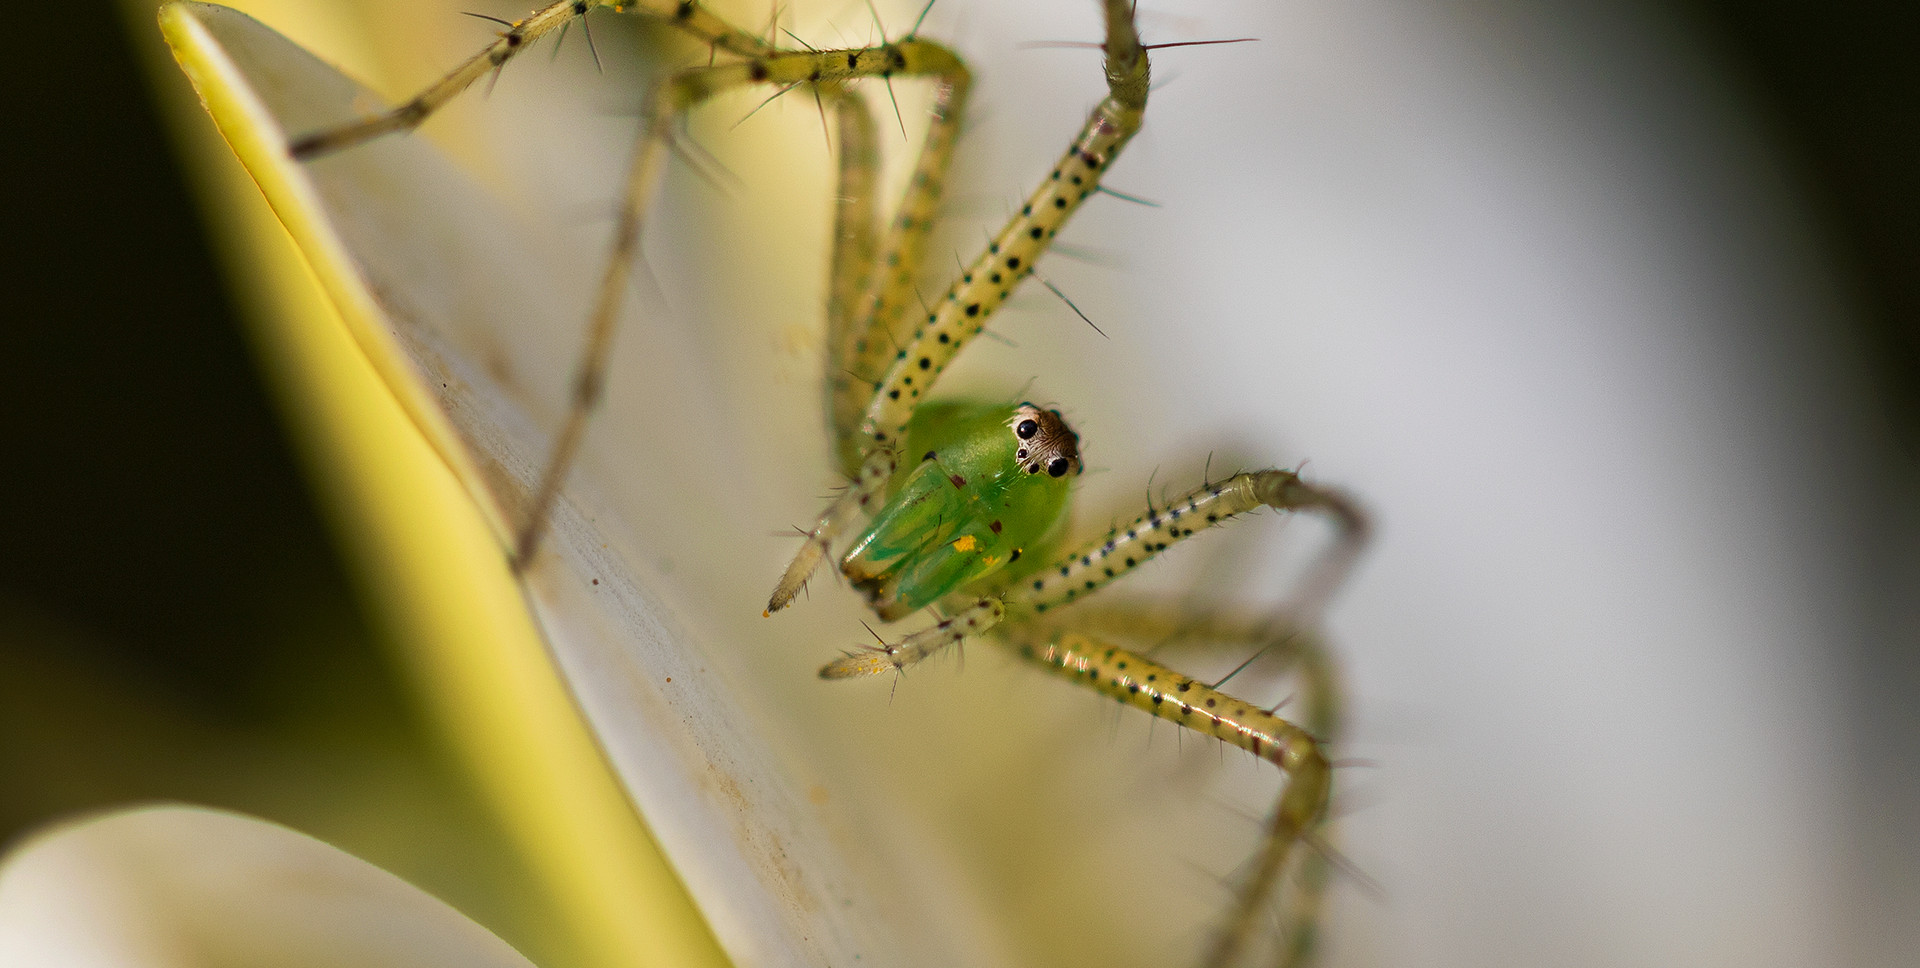 Araña lince verde (Peucetia viridans)